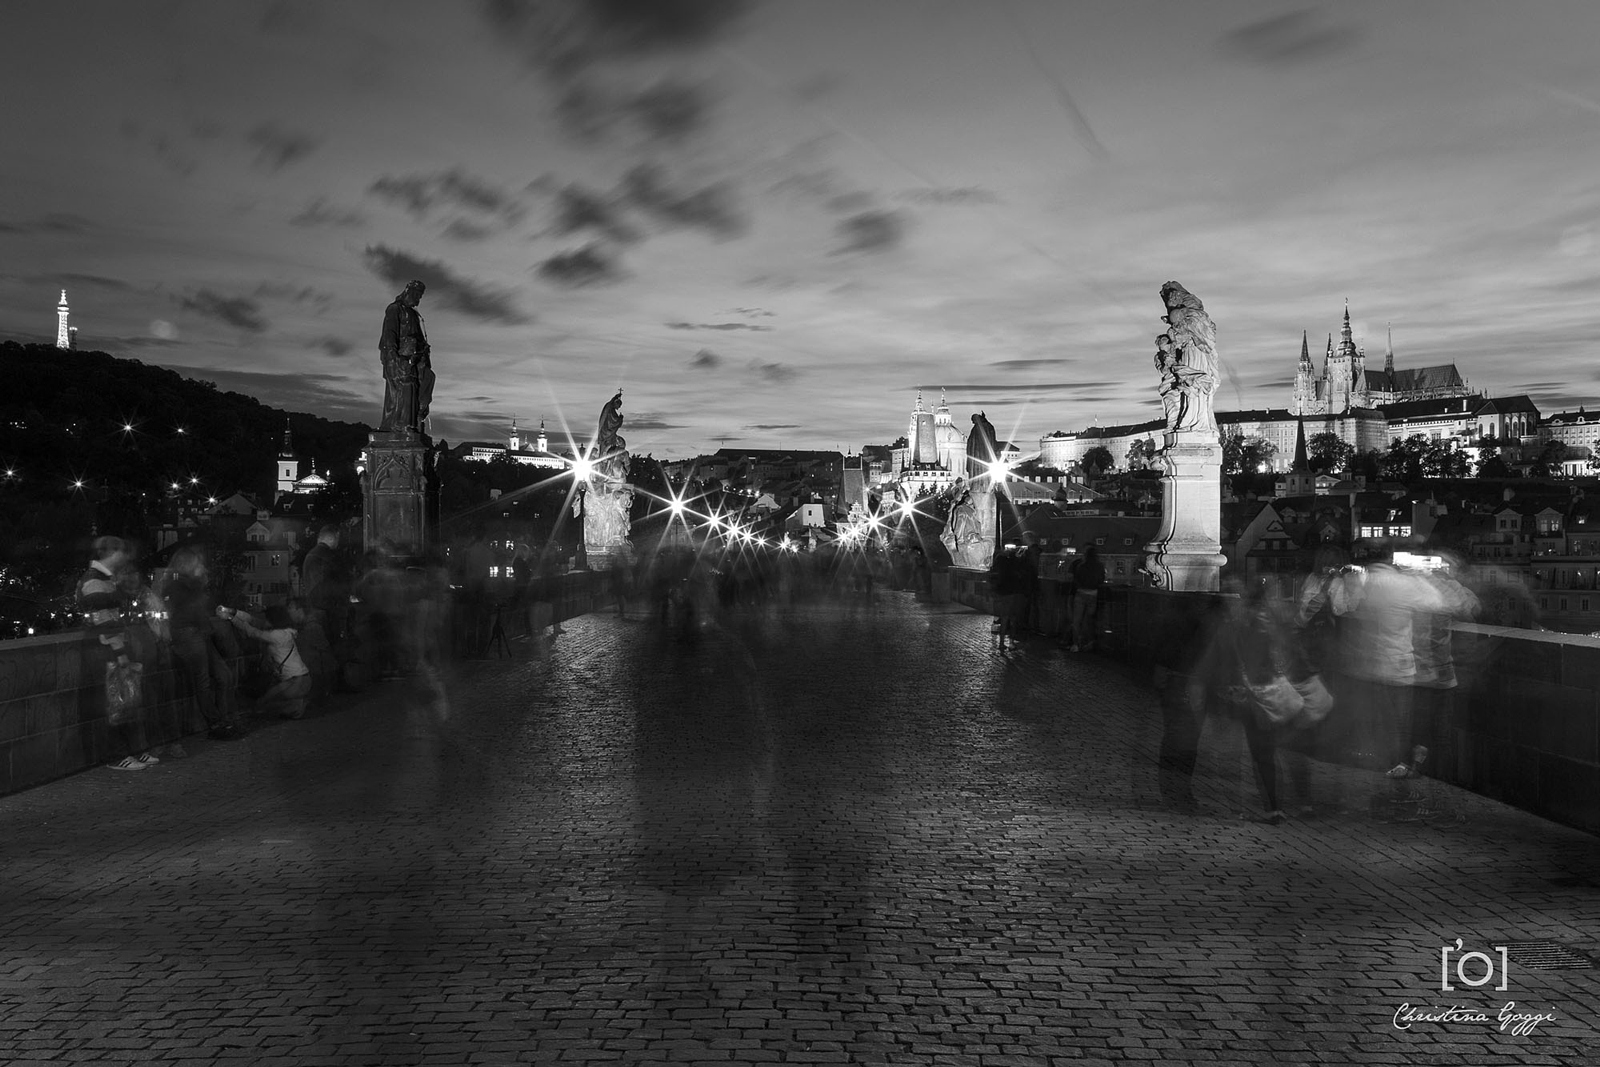 Tutorial: Capturing the Spectral Effect on Prague's Iconic Bridge